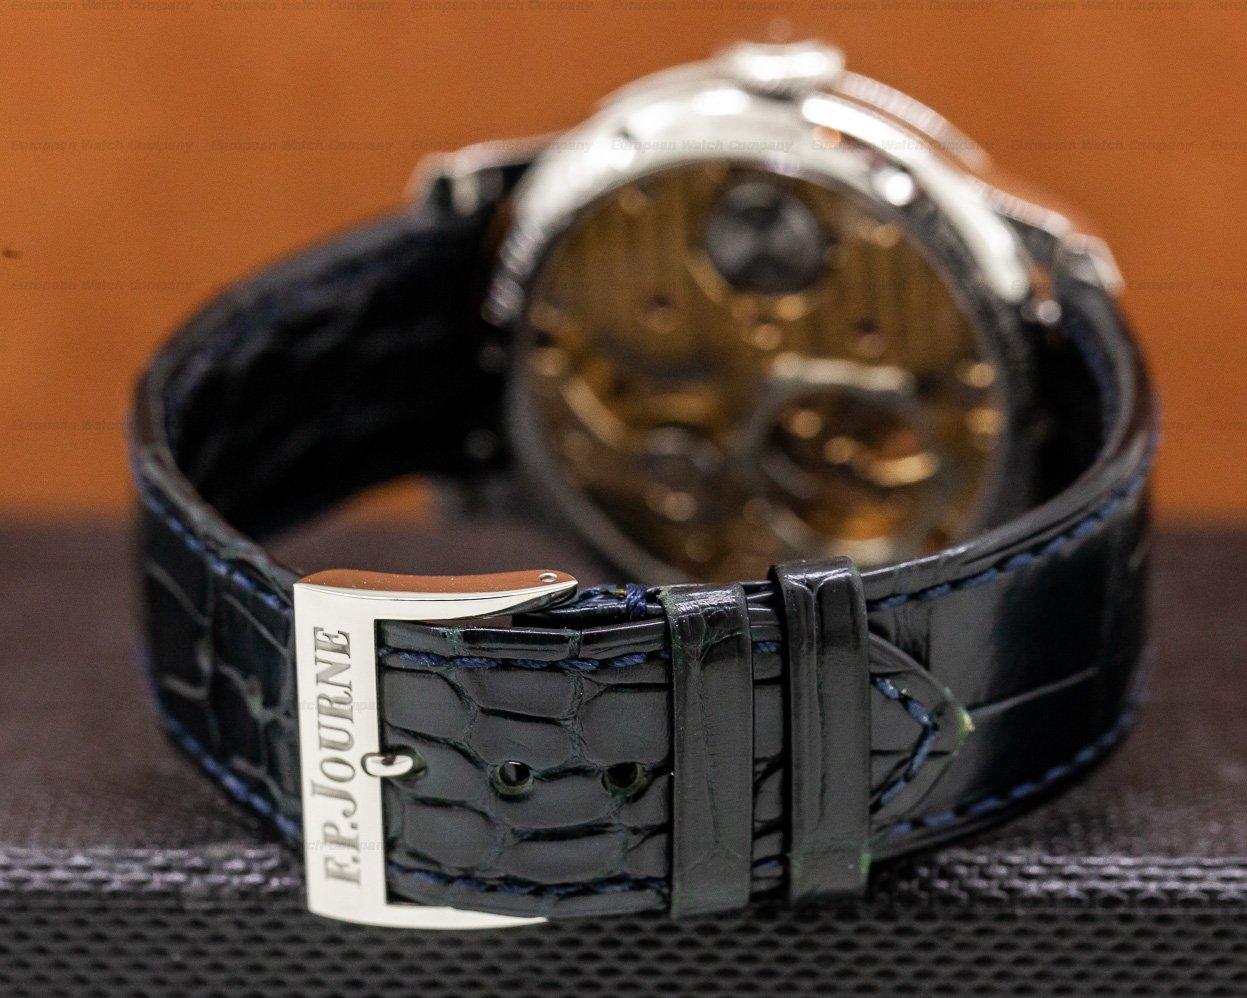 F. P. Journe 145-CO Chronometre Optimum Platinum / Silver Dial 42MM